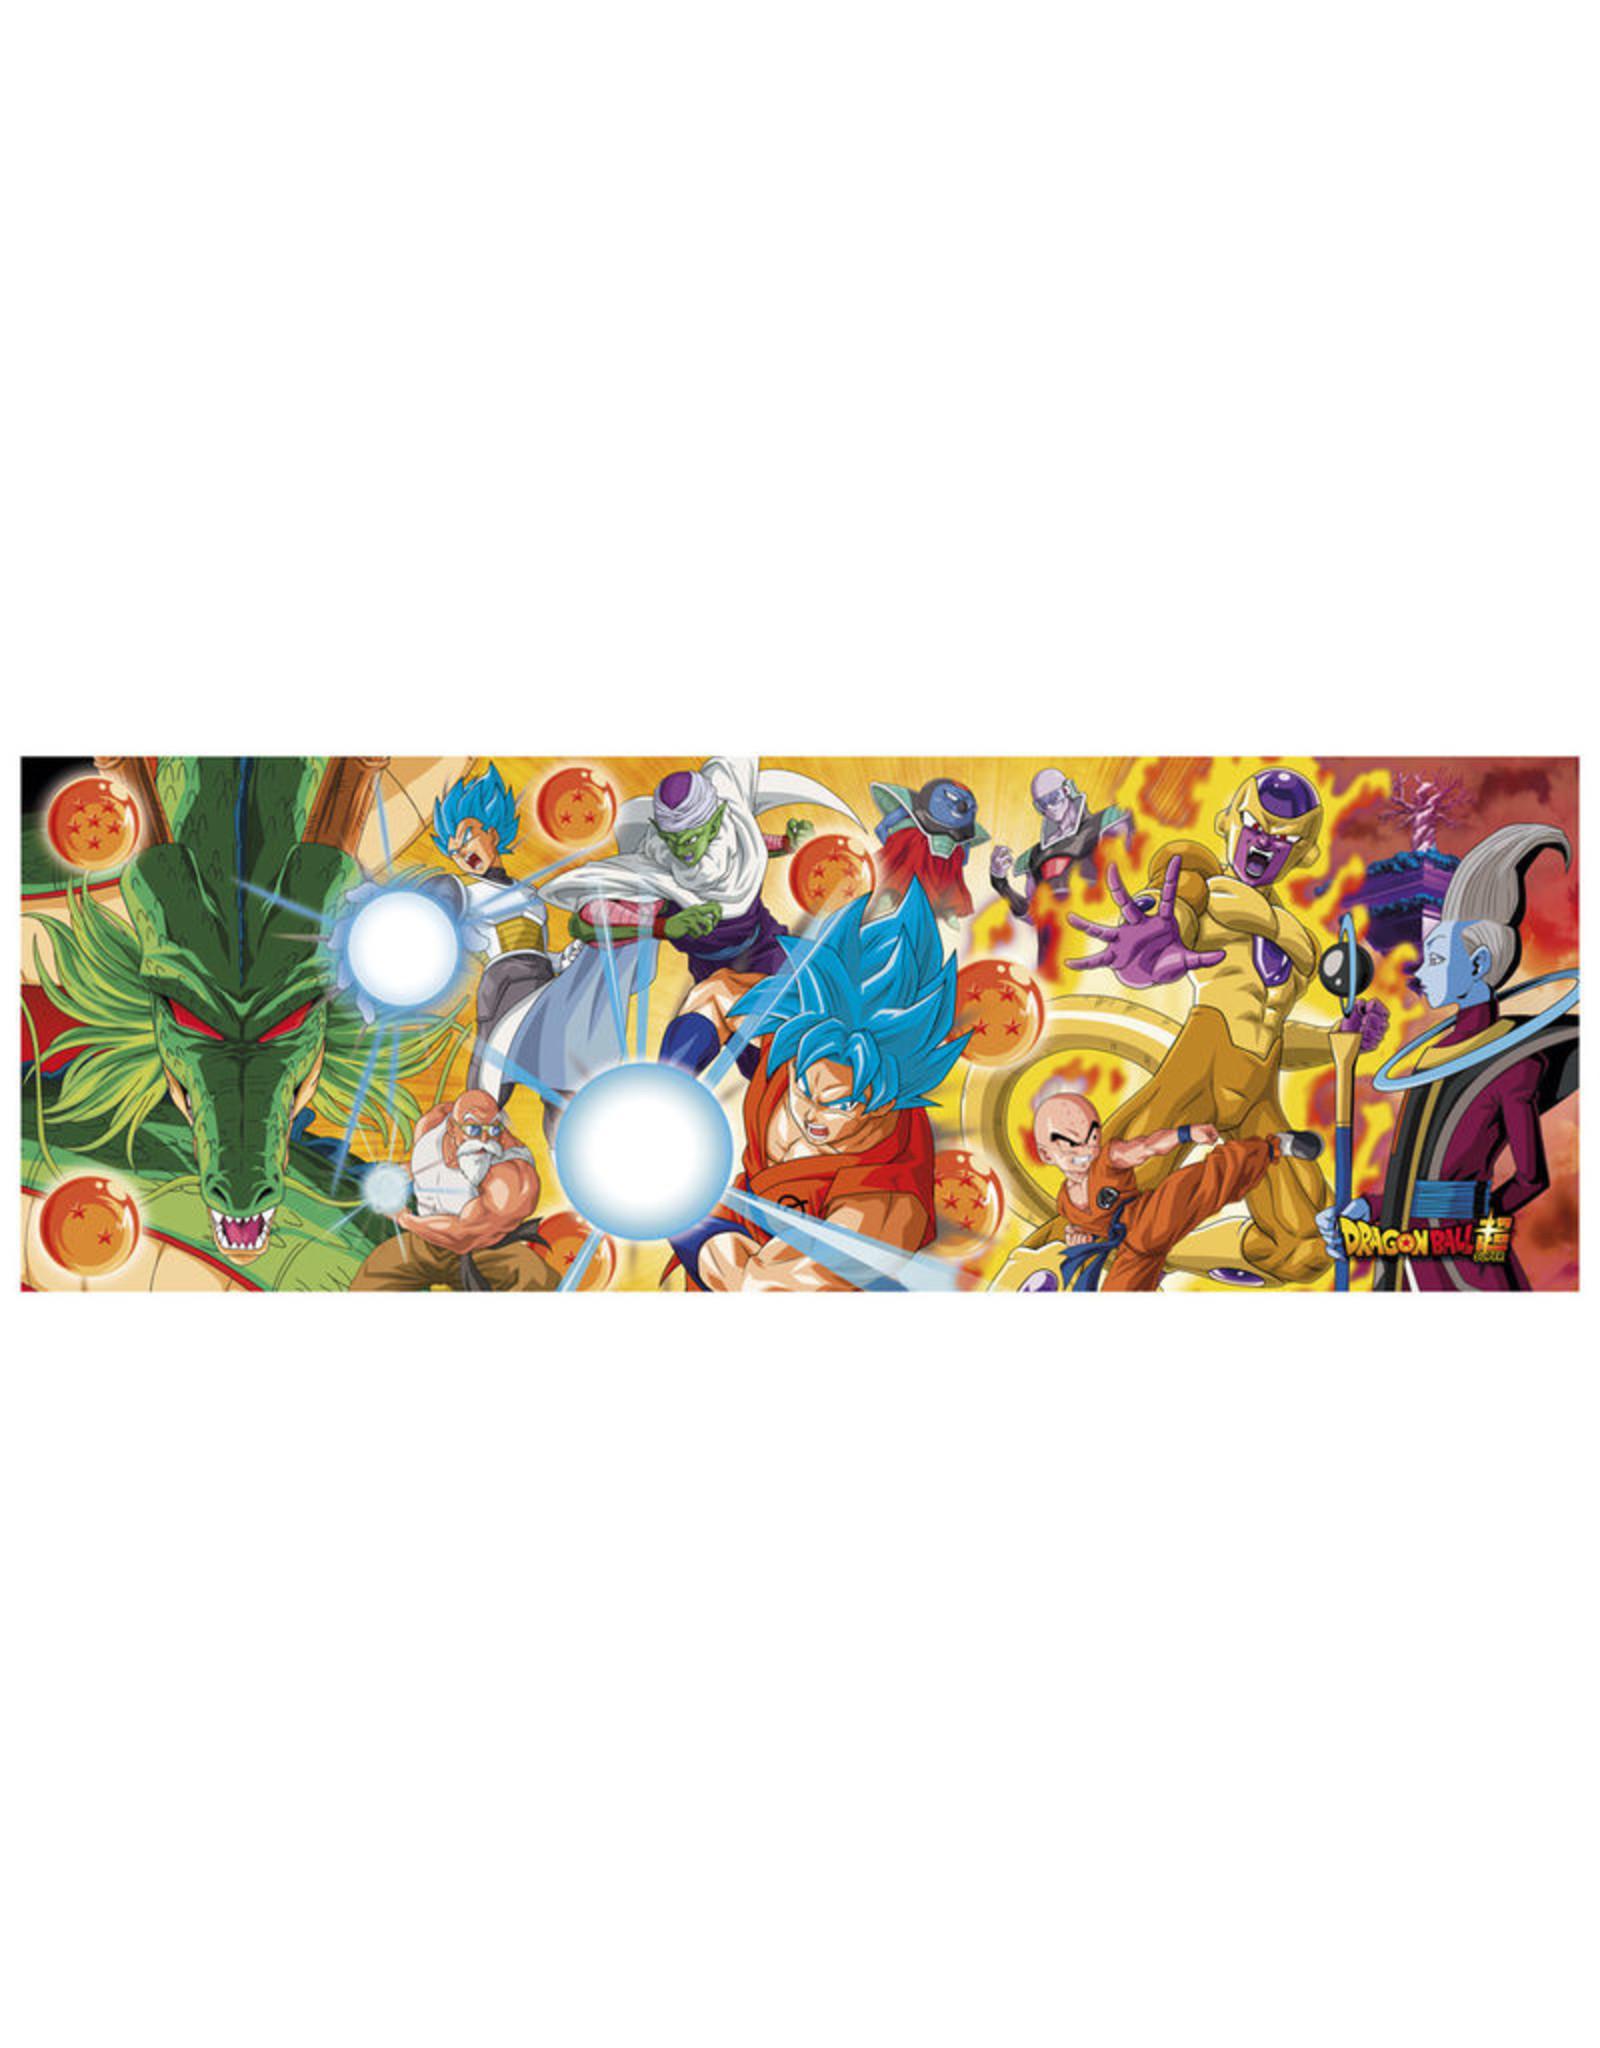 CLEMENTONI Dragon Ball Super Panorama puzzel 1000 st.